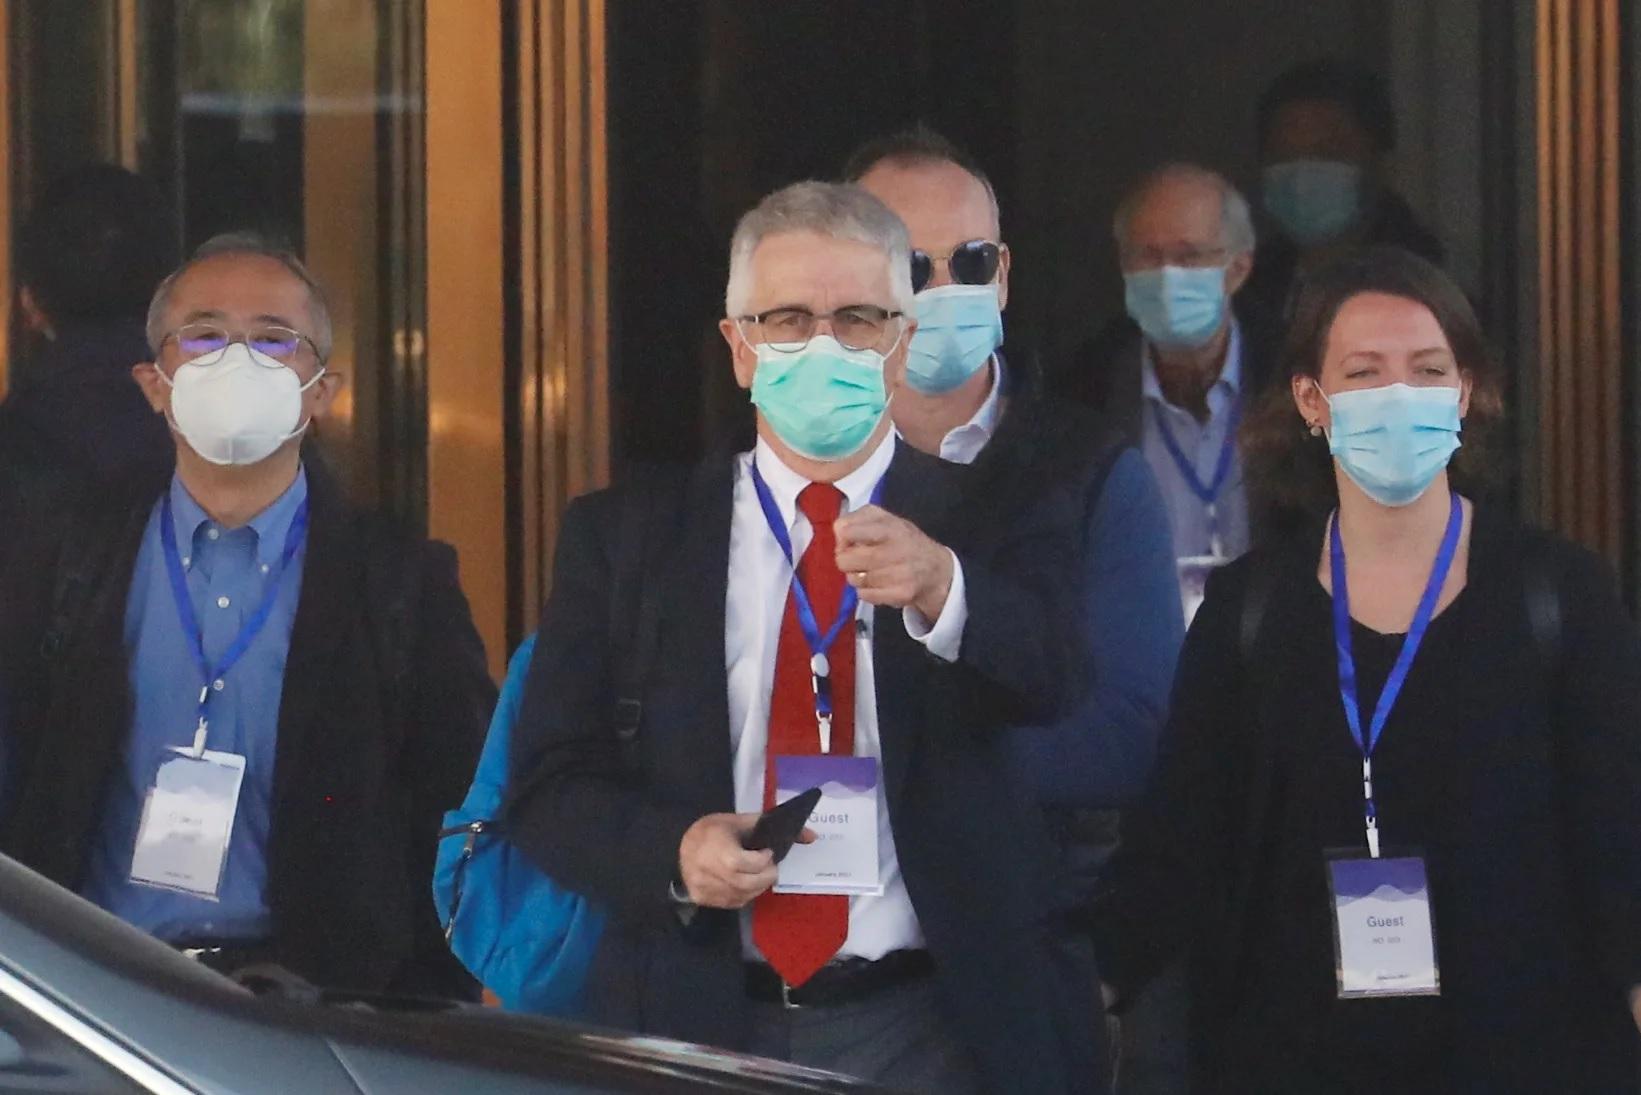 https: img.okezone.com content 2021 02 15 18 2361999 china-tolak-berikan-data-awal-covid-19-ke-tim-who-yang-menyelidiki-asal-usul-pandemi-UzQguyUQbJ.jpg